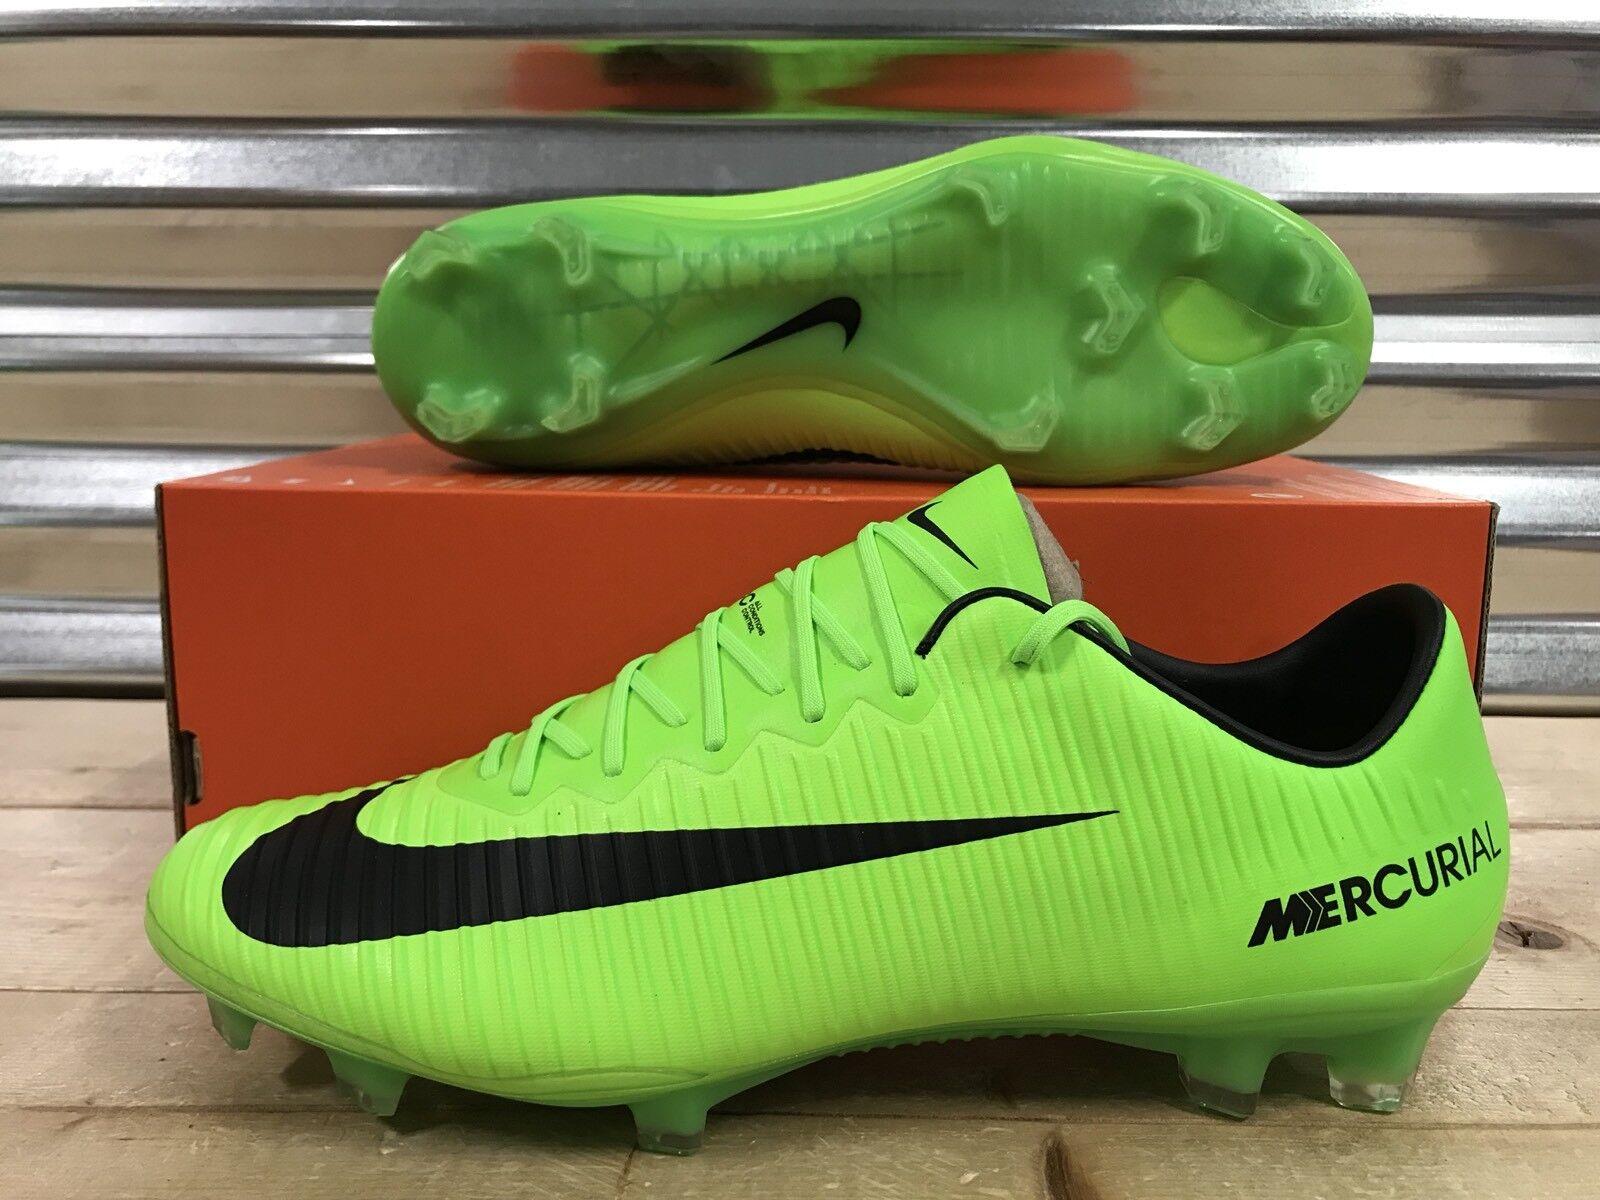 Nike Mercurial Vapor Vapor Vapor XI FG ACC Soccer Cleats Electric Green SZ ( 831958-303 ) 642718